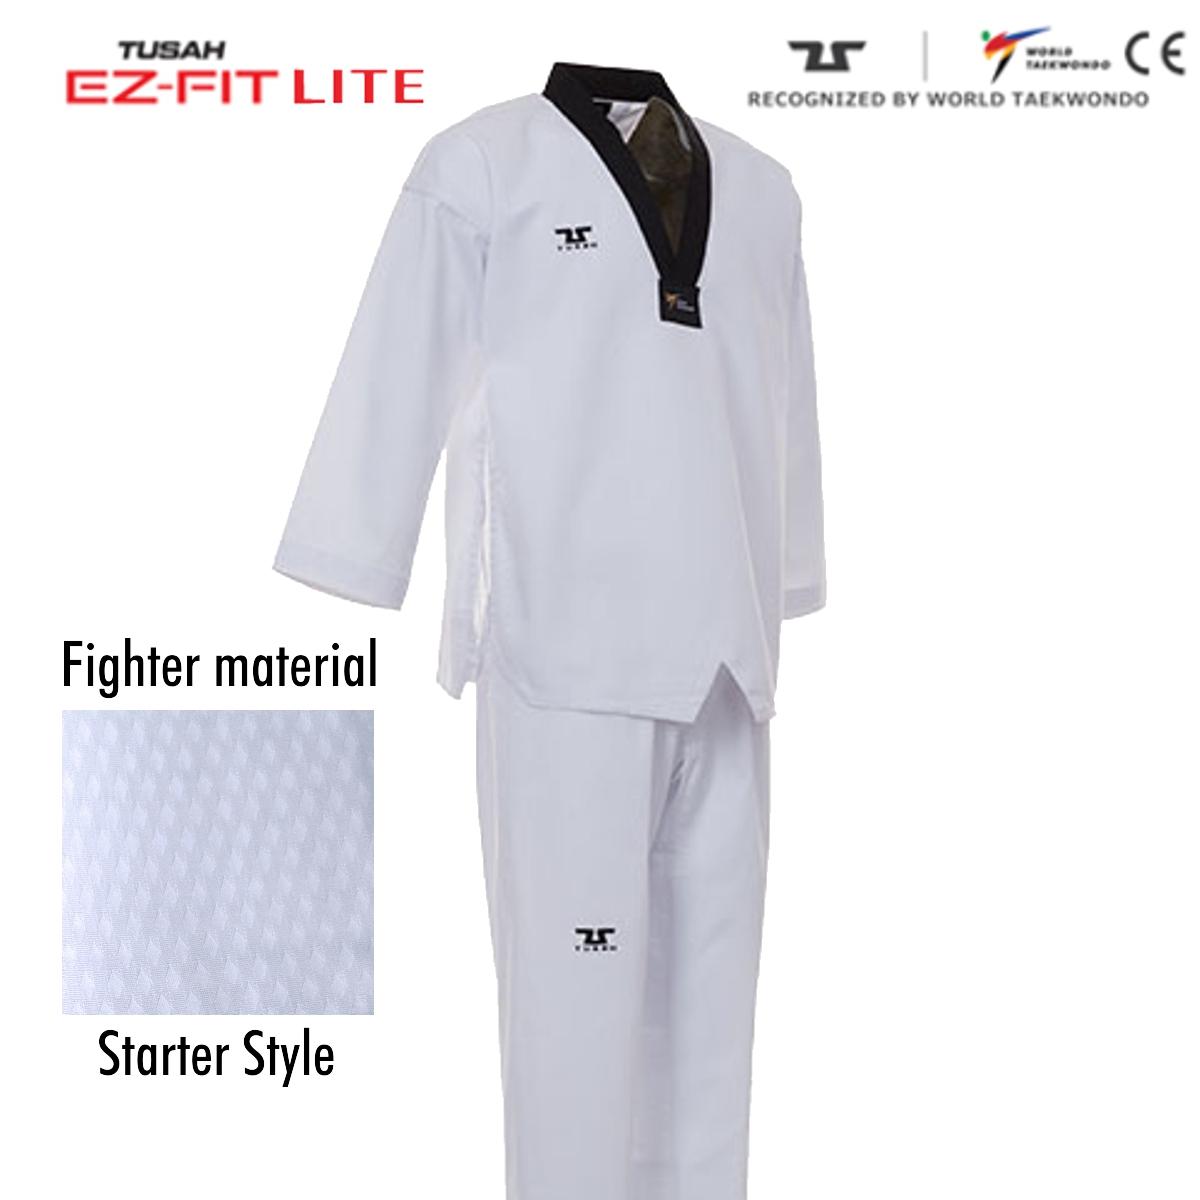 Ez-Fit Lite Fighter Uniform Black Collar